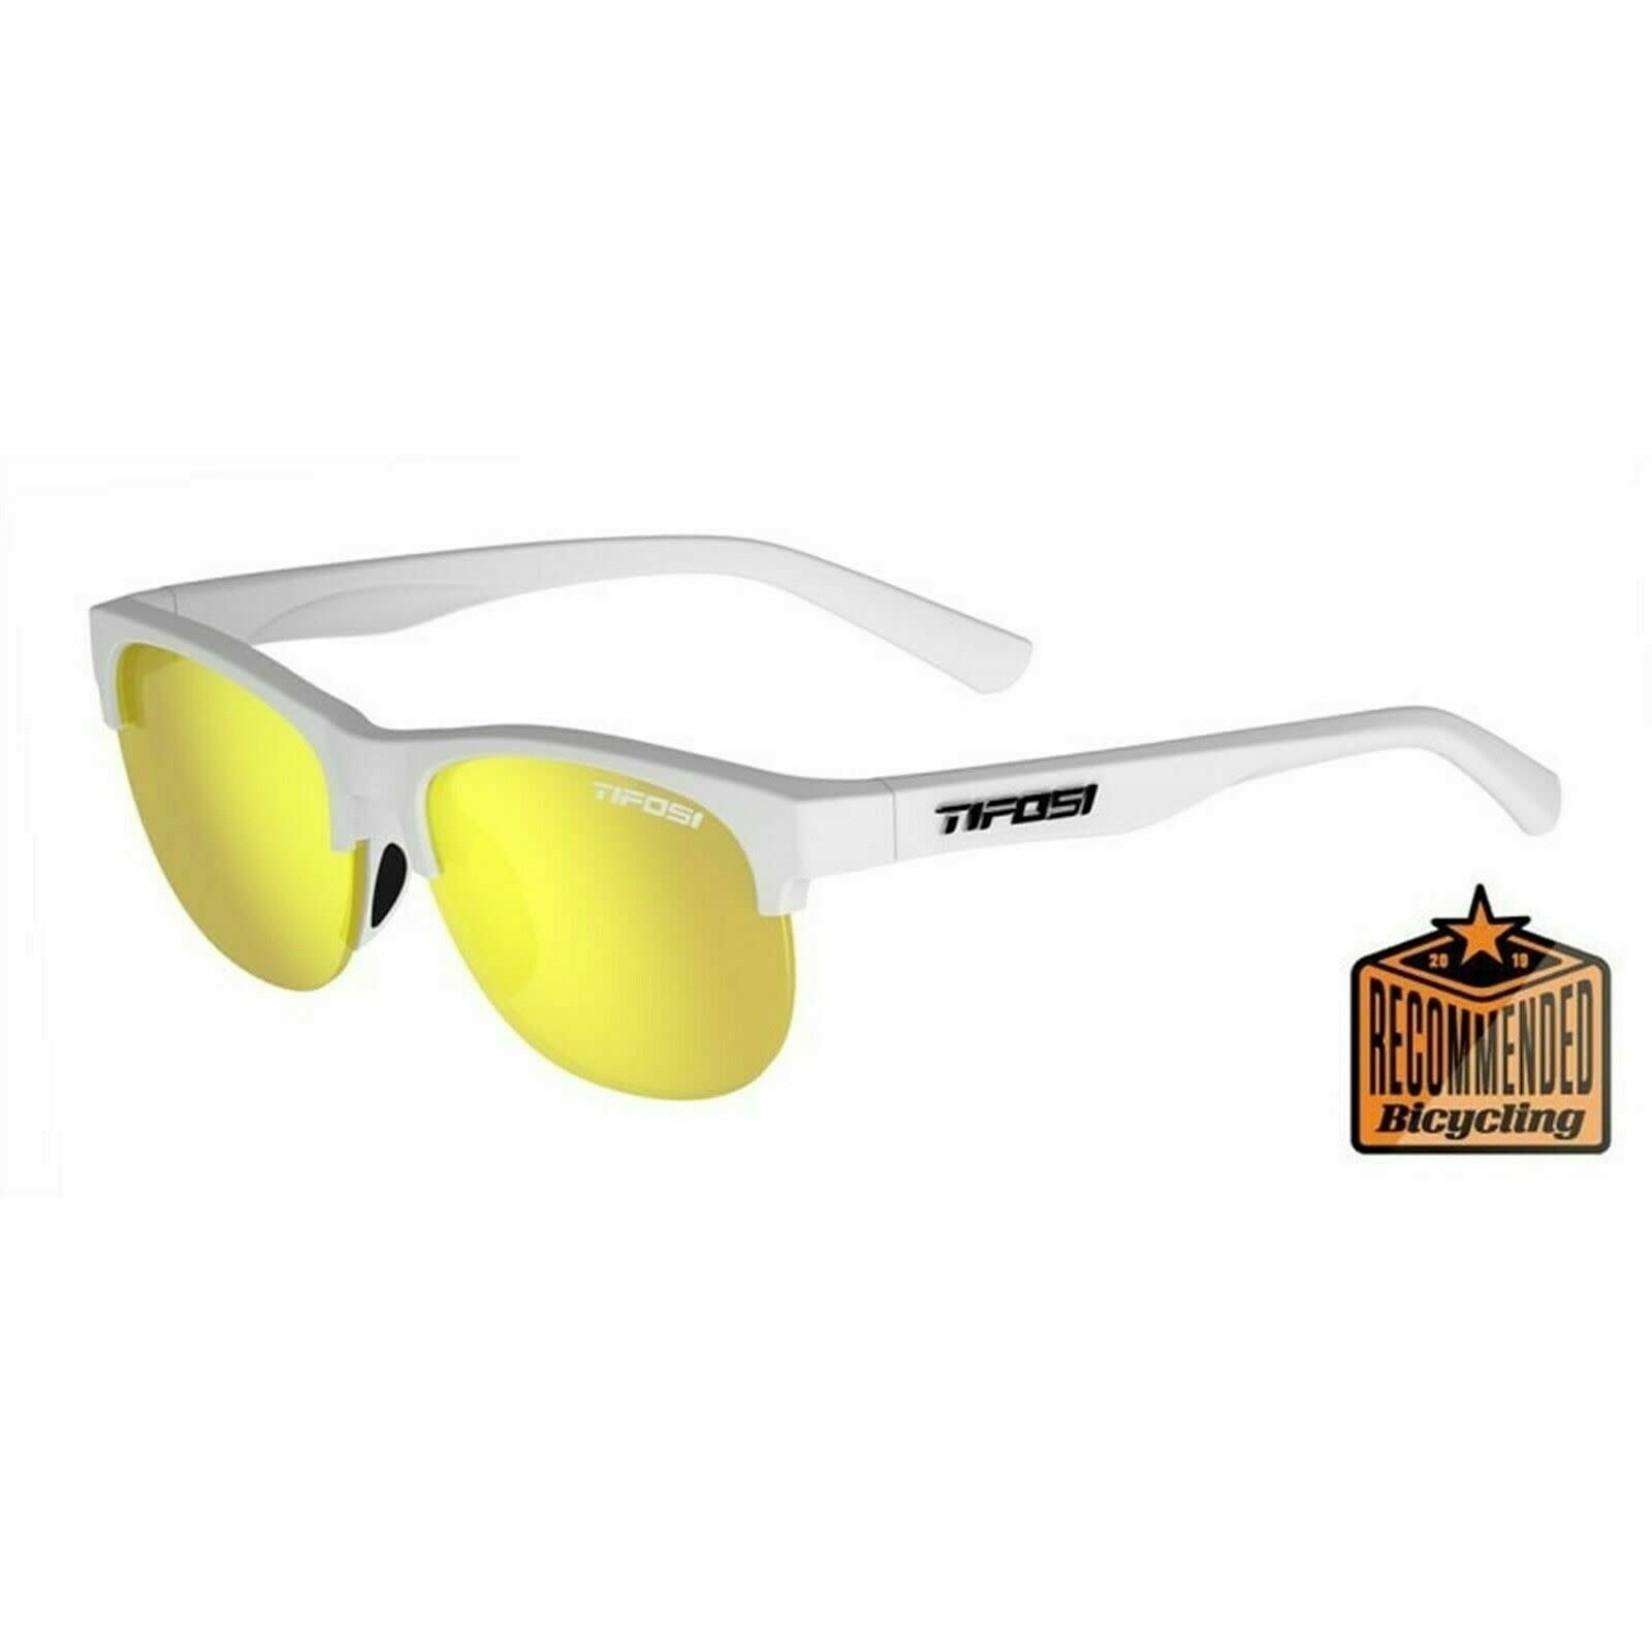 Tifosi Optics Swank SL, Satin Frost Single Lens Sunglasses Smoke Yellow